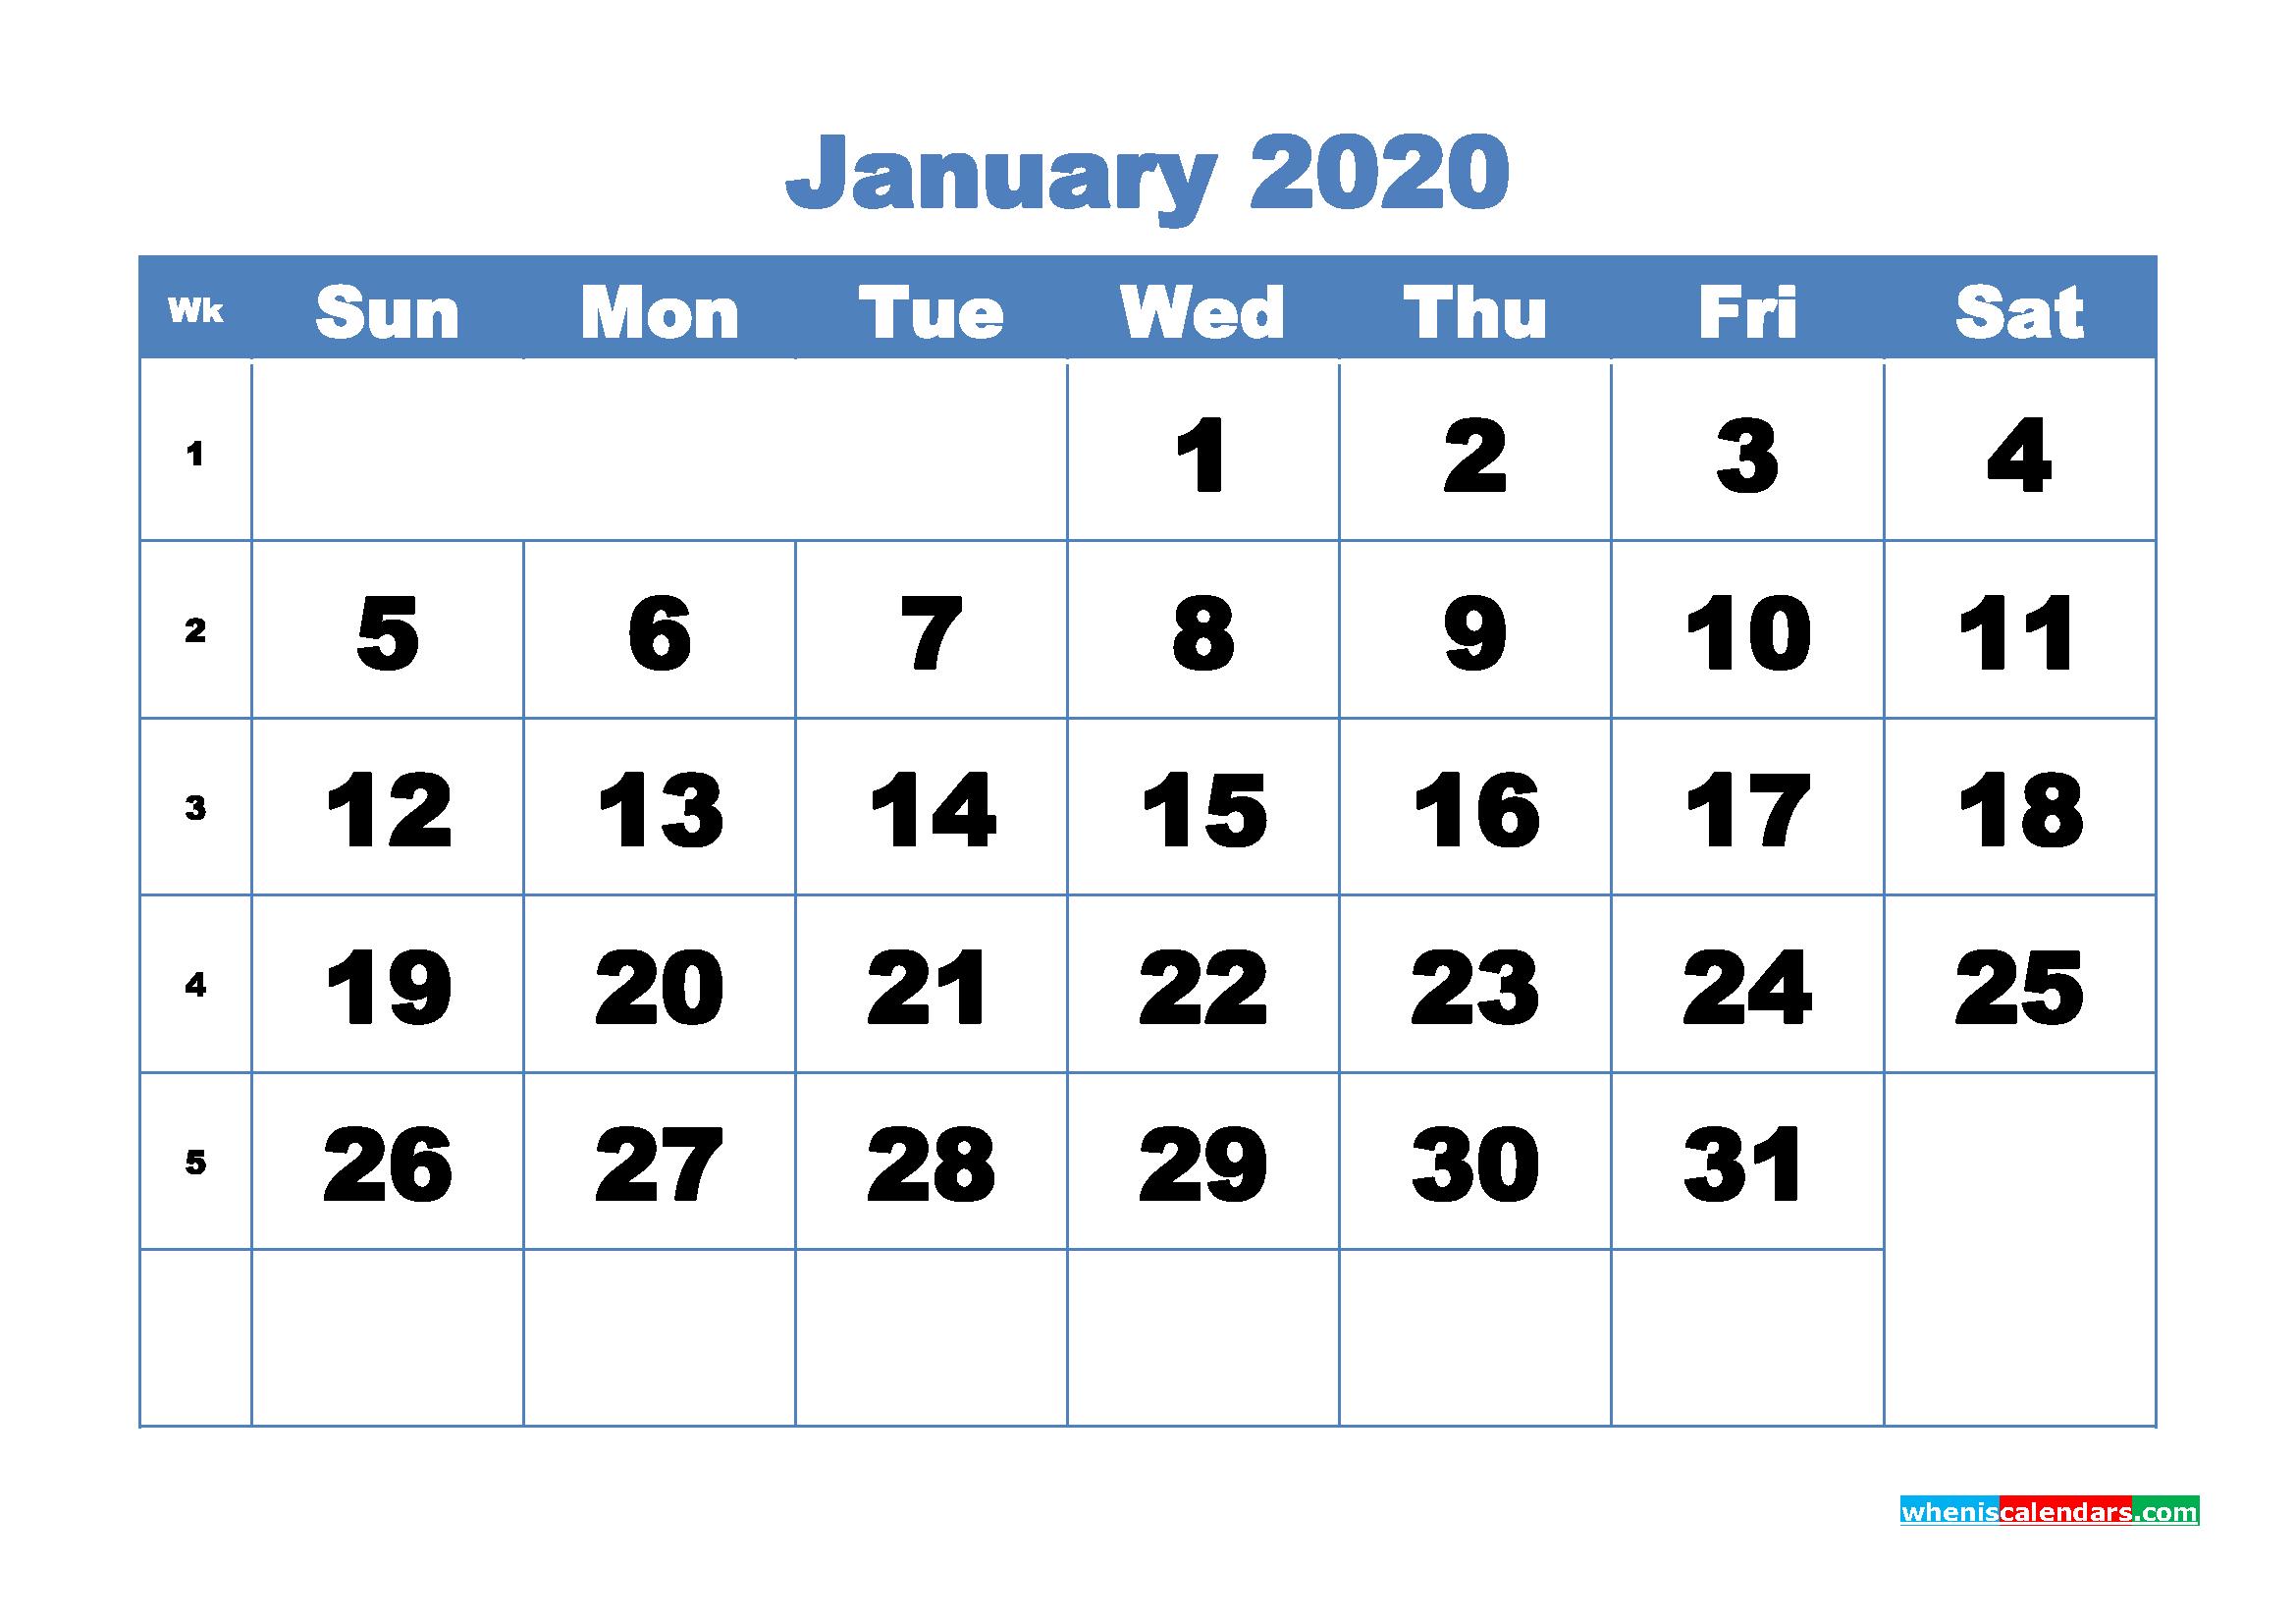 January Printable Calendar 2020 PDF, Word - No.m20b301